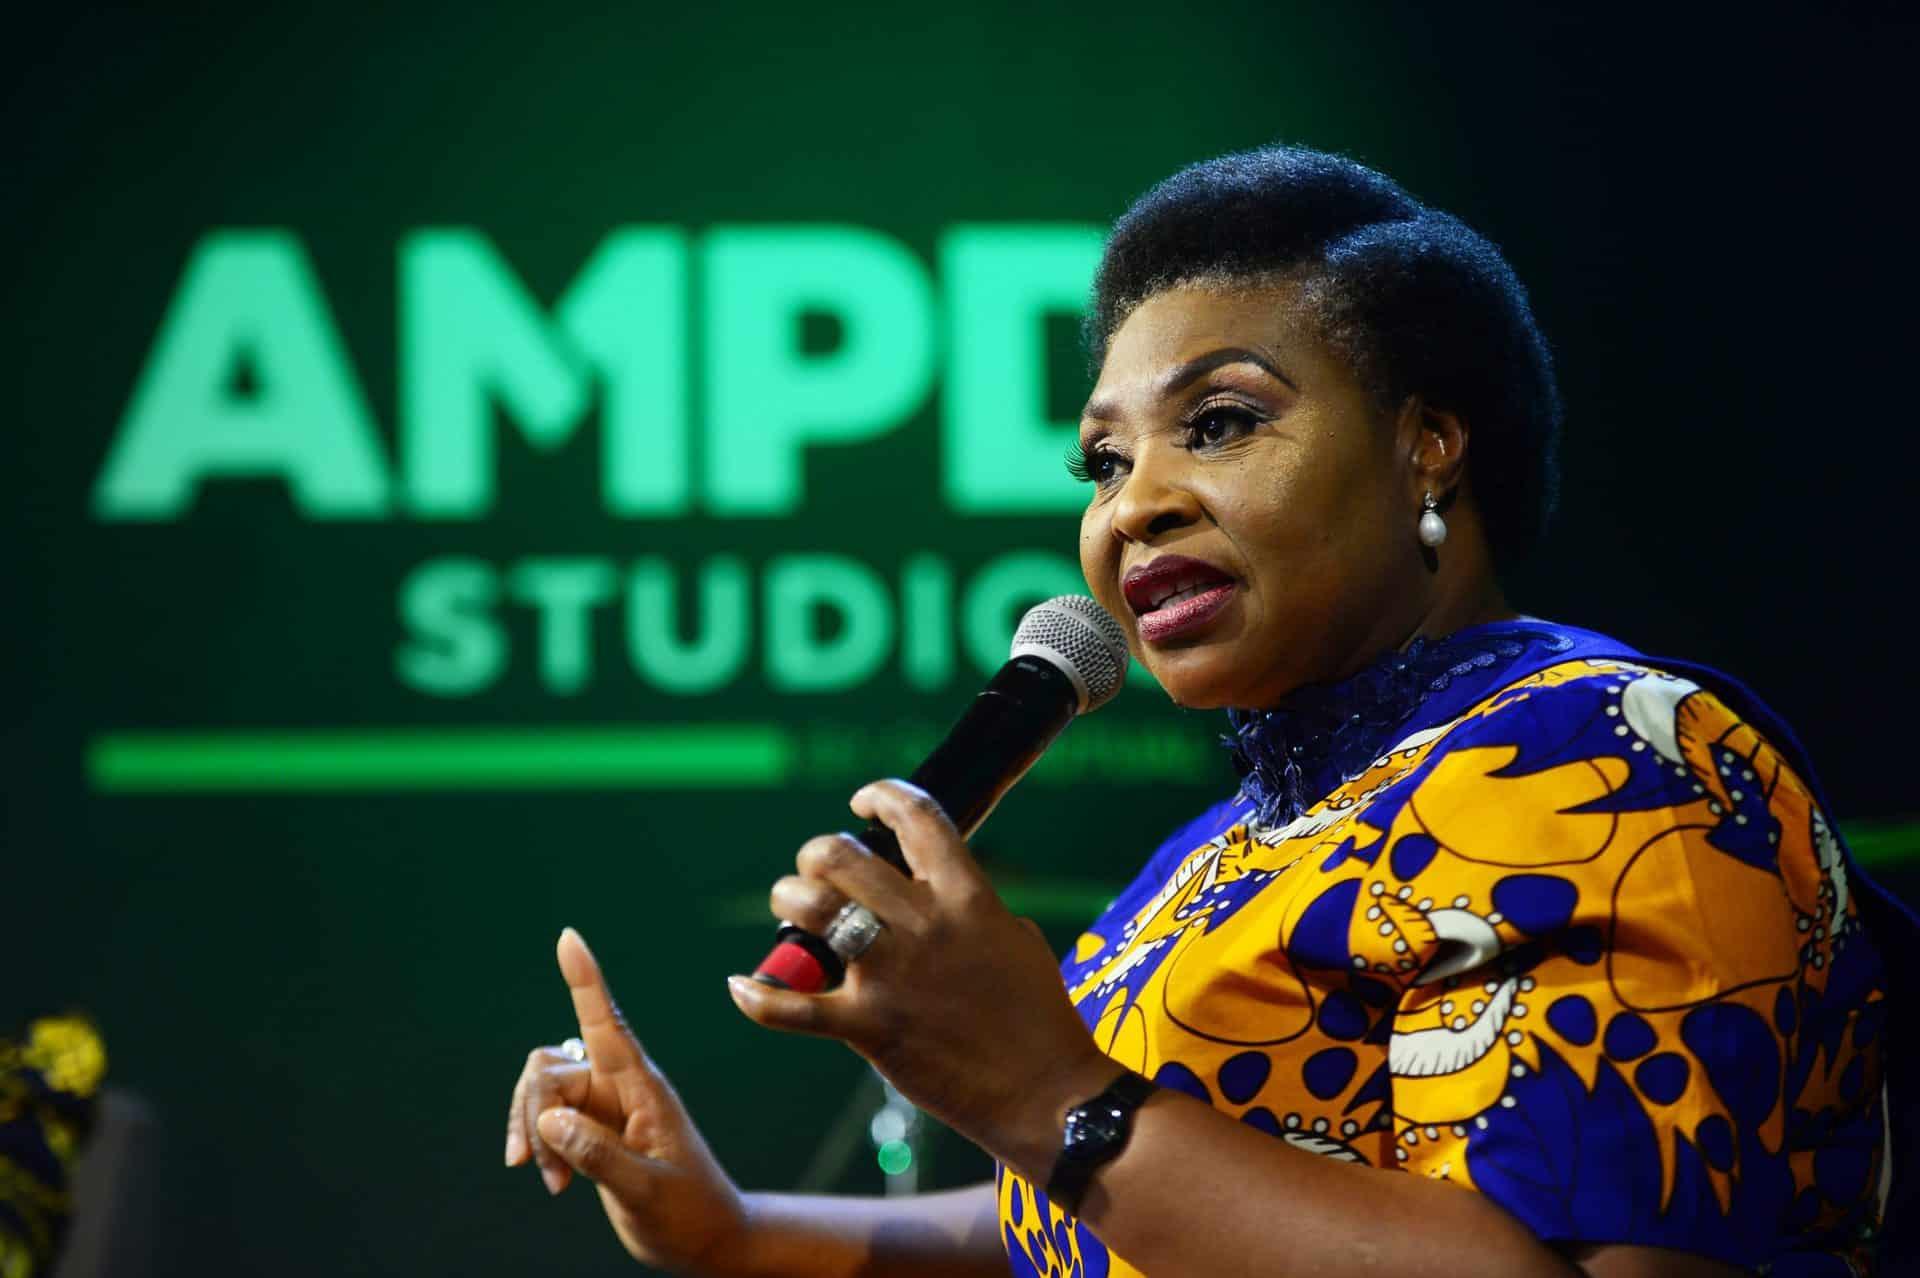 AMPD Studios Yvonne Chaka Chaka & Zolani Mahola (2)